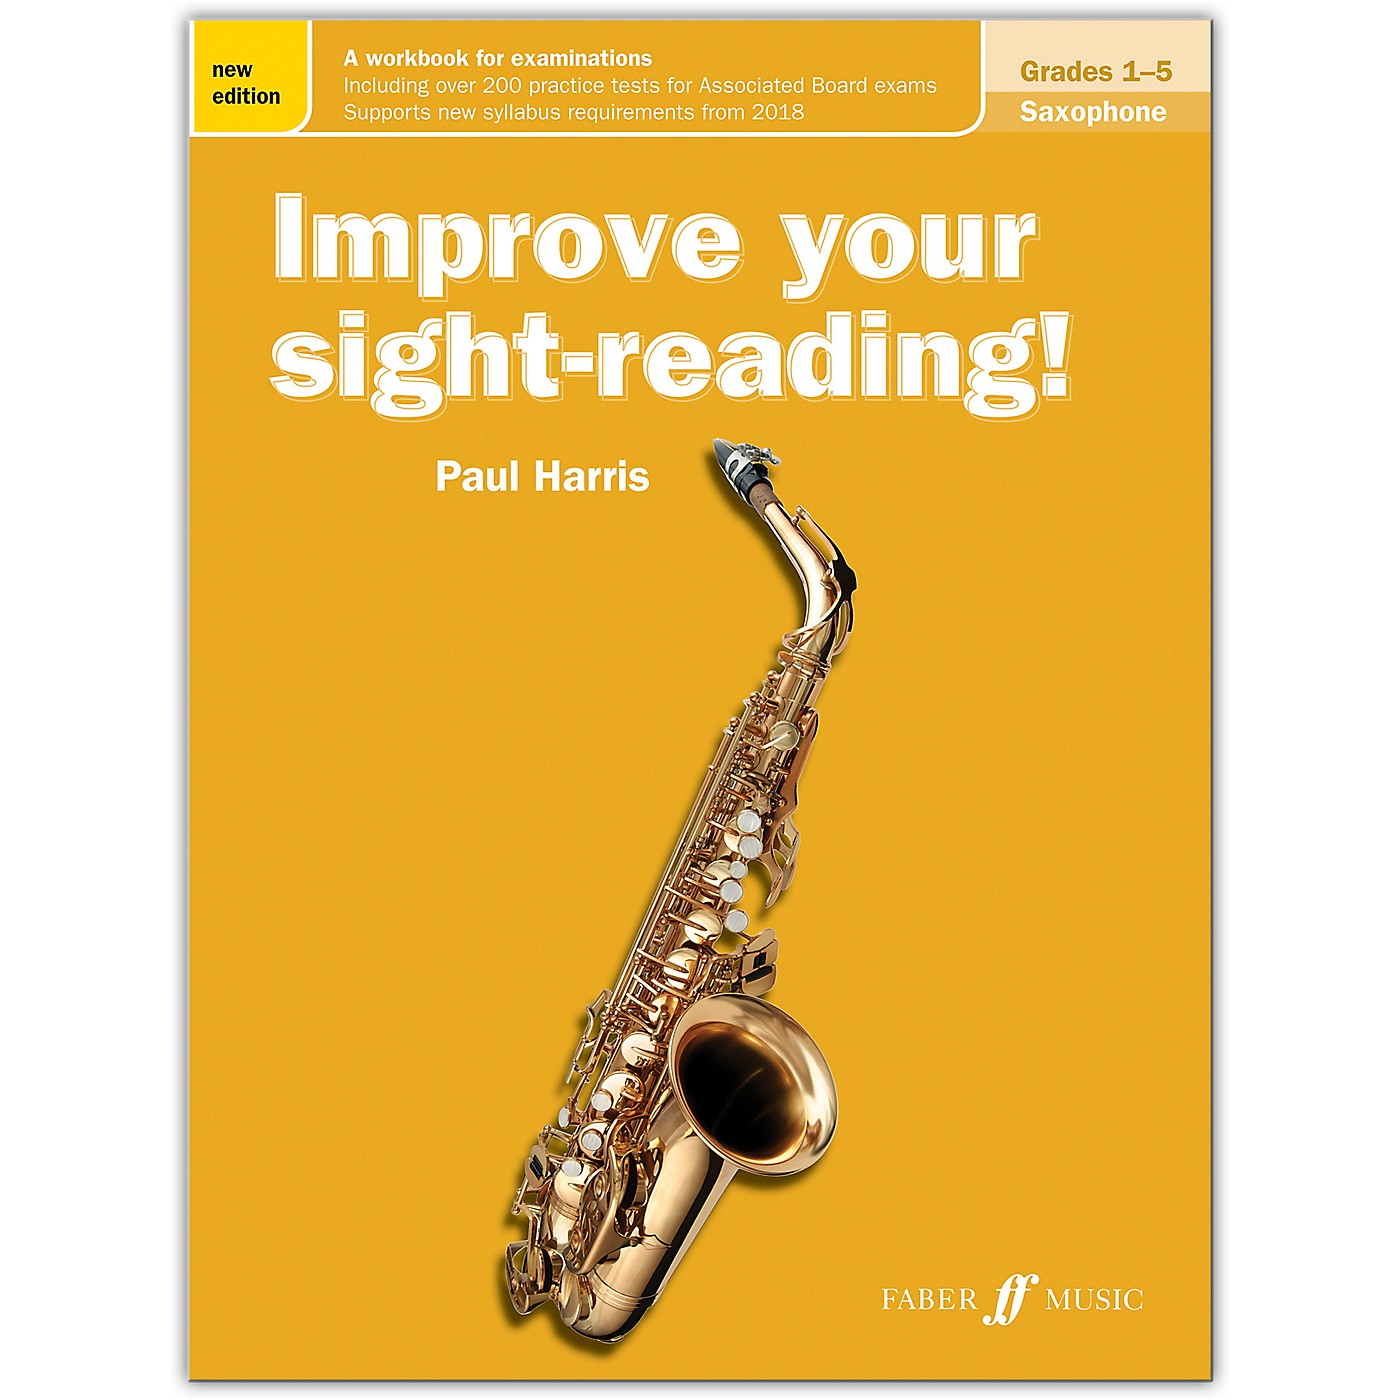 Faber Music LTD Improve Your Sight-Reading! Saxophone, Grades 1-5 (New Edition) thumbnail